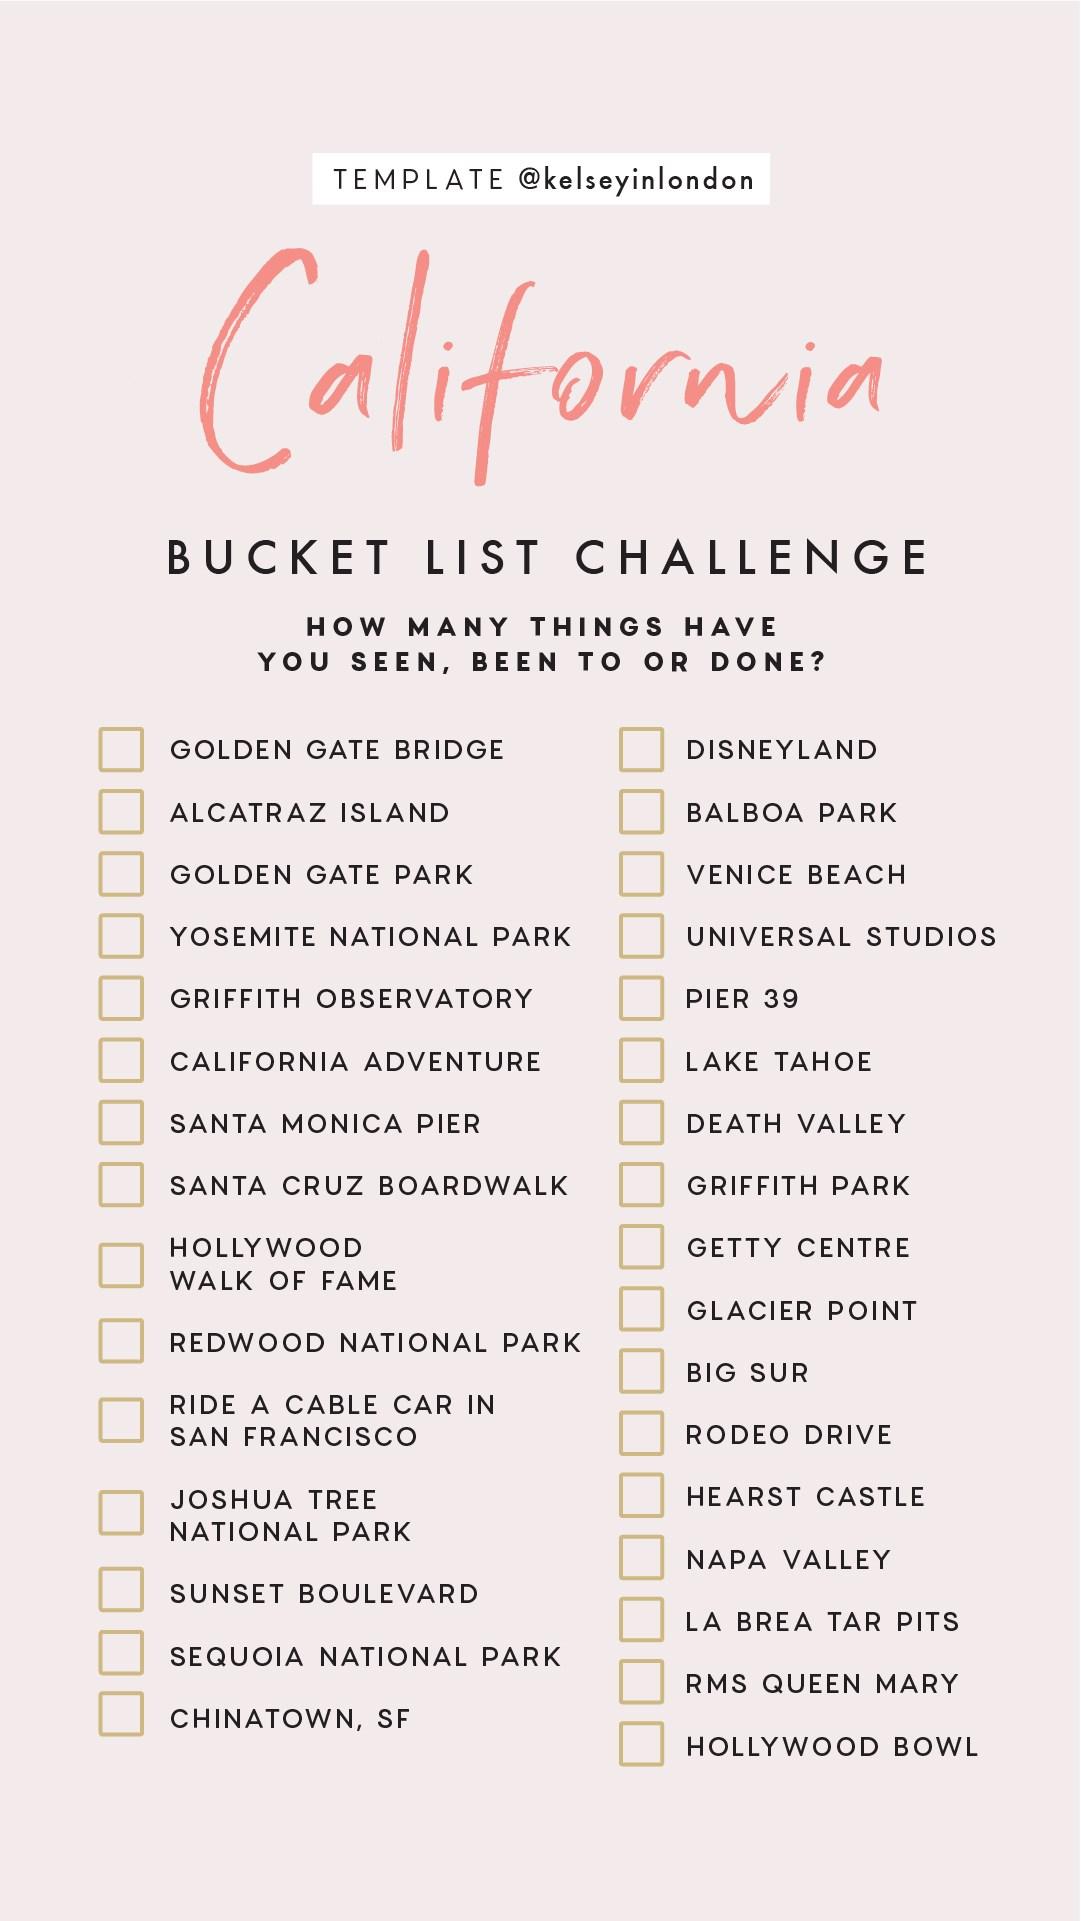 Top things to do in California Bucket list Instagram Story Template kelseyinlondon Kelsey Heinrichs What to do in California Where to go in California top places in California